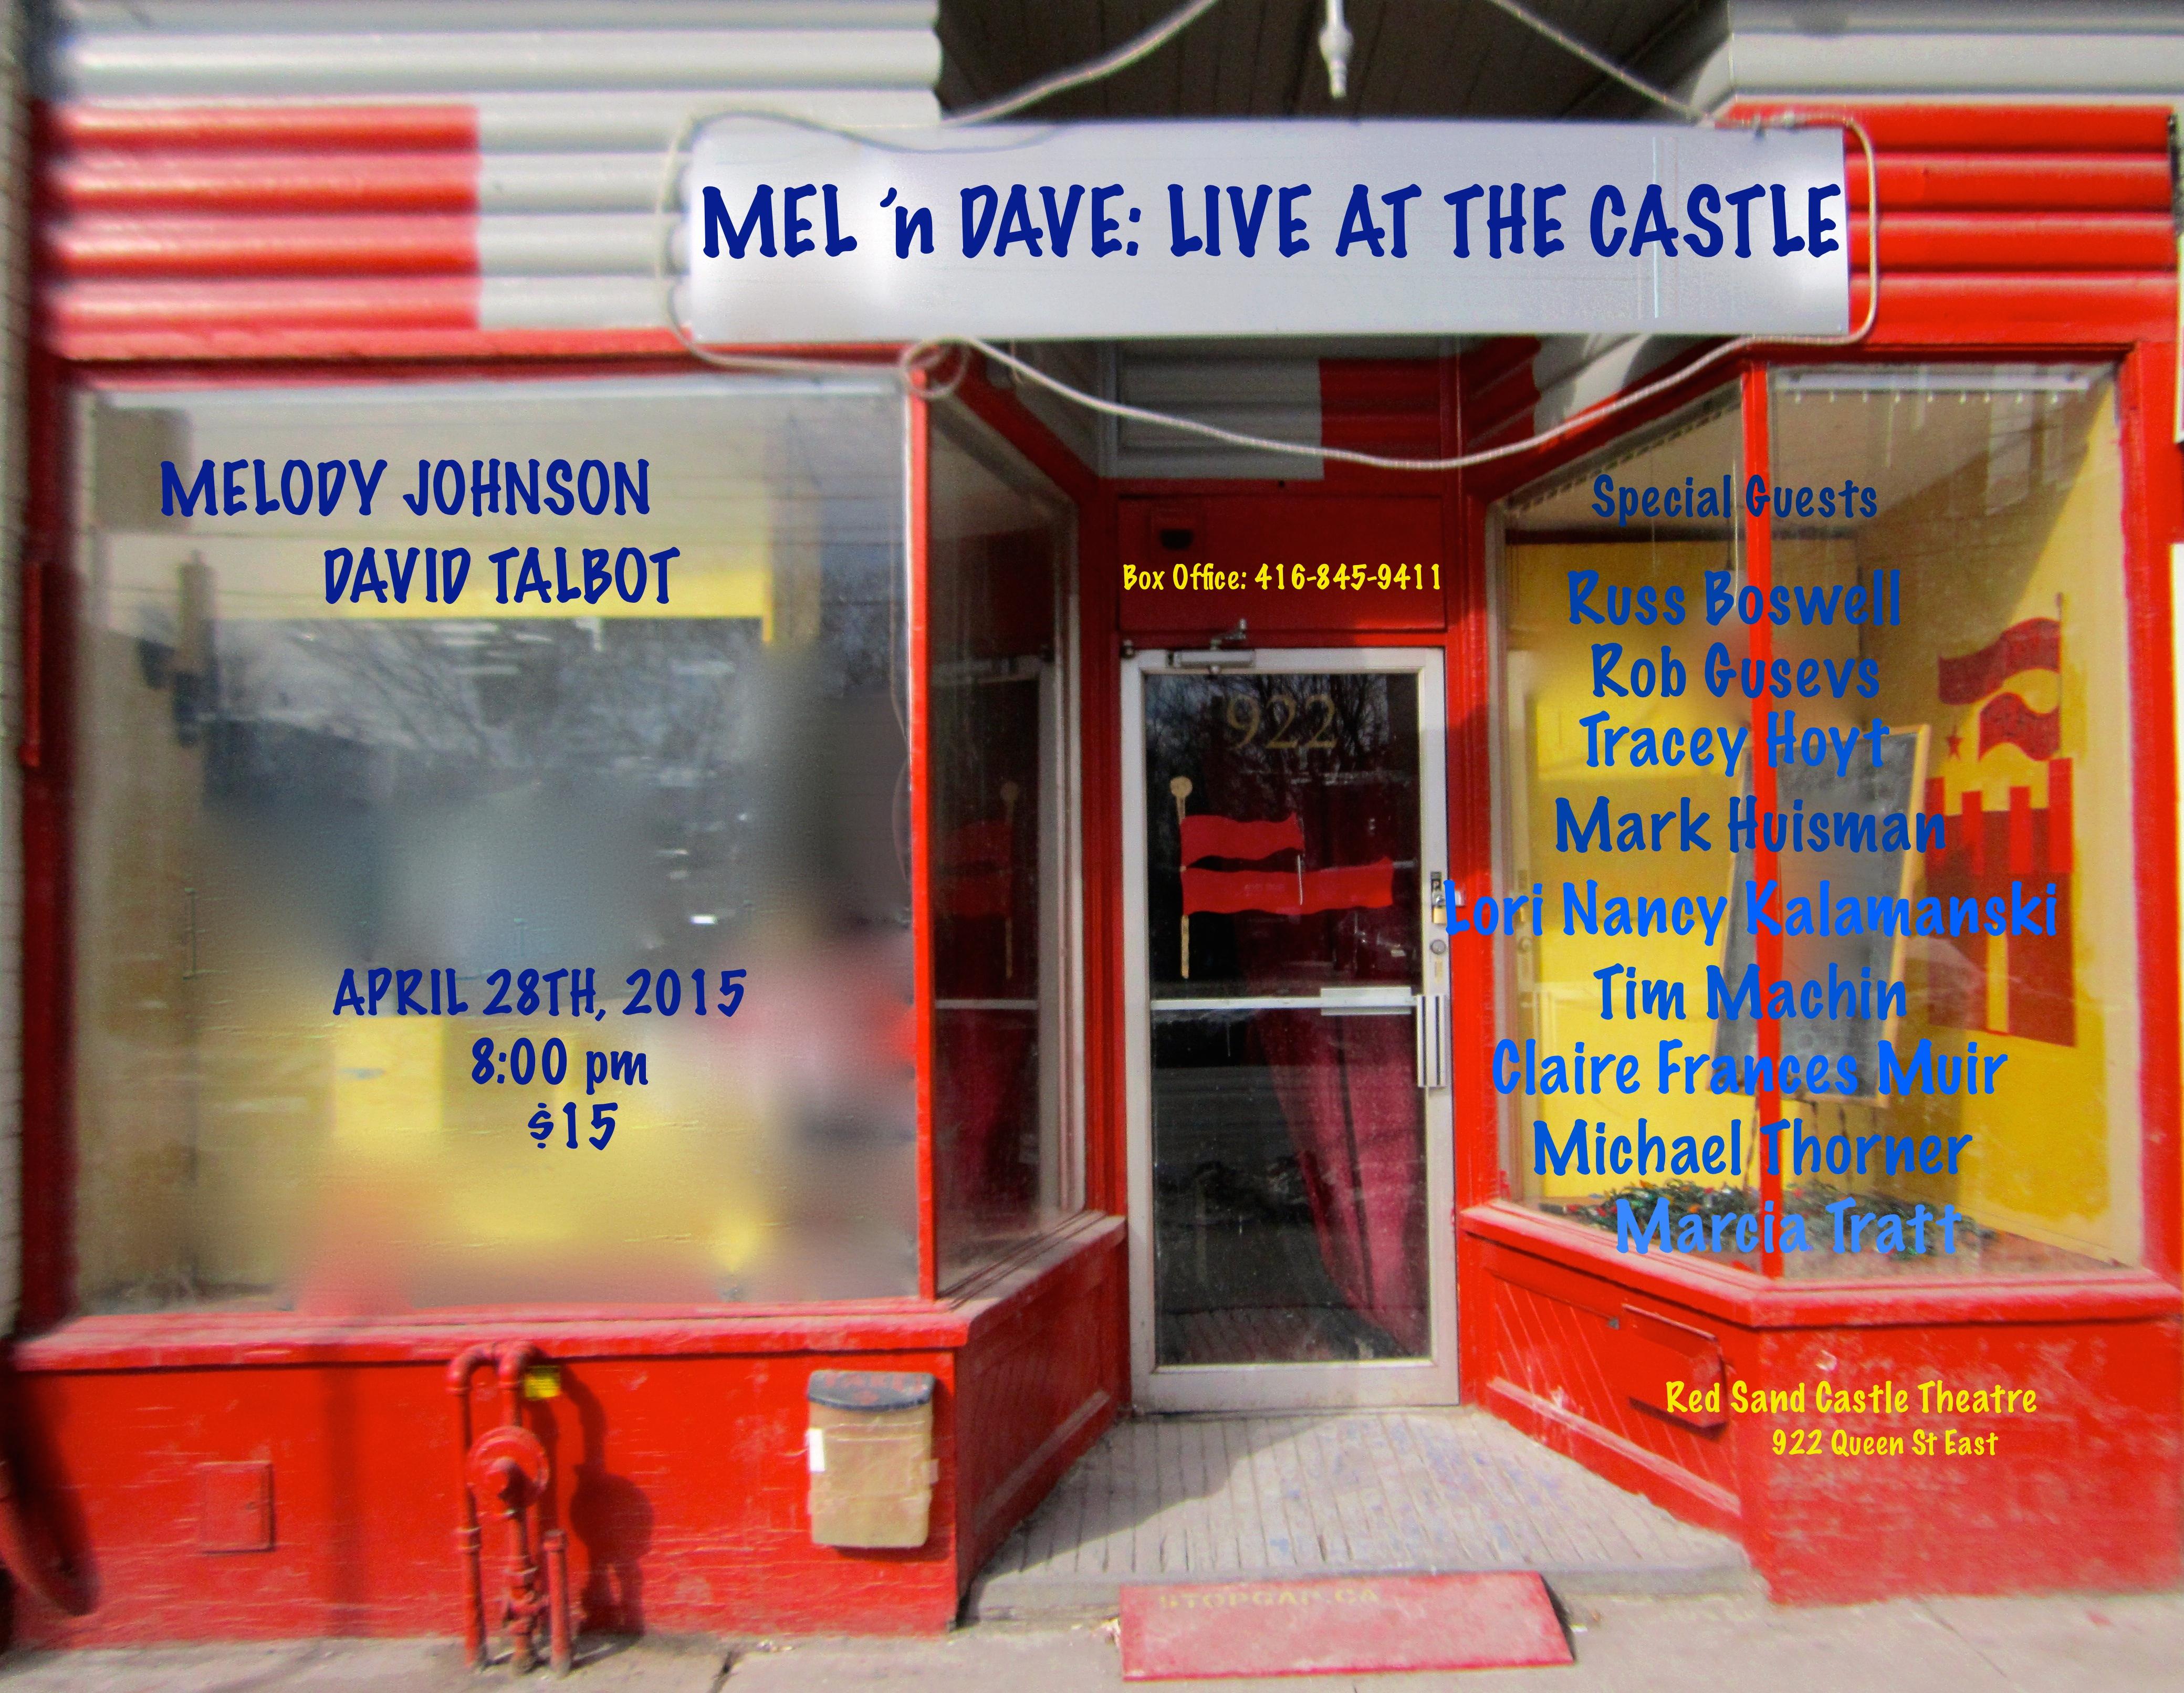 Mel 'n Dave April 28th